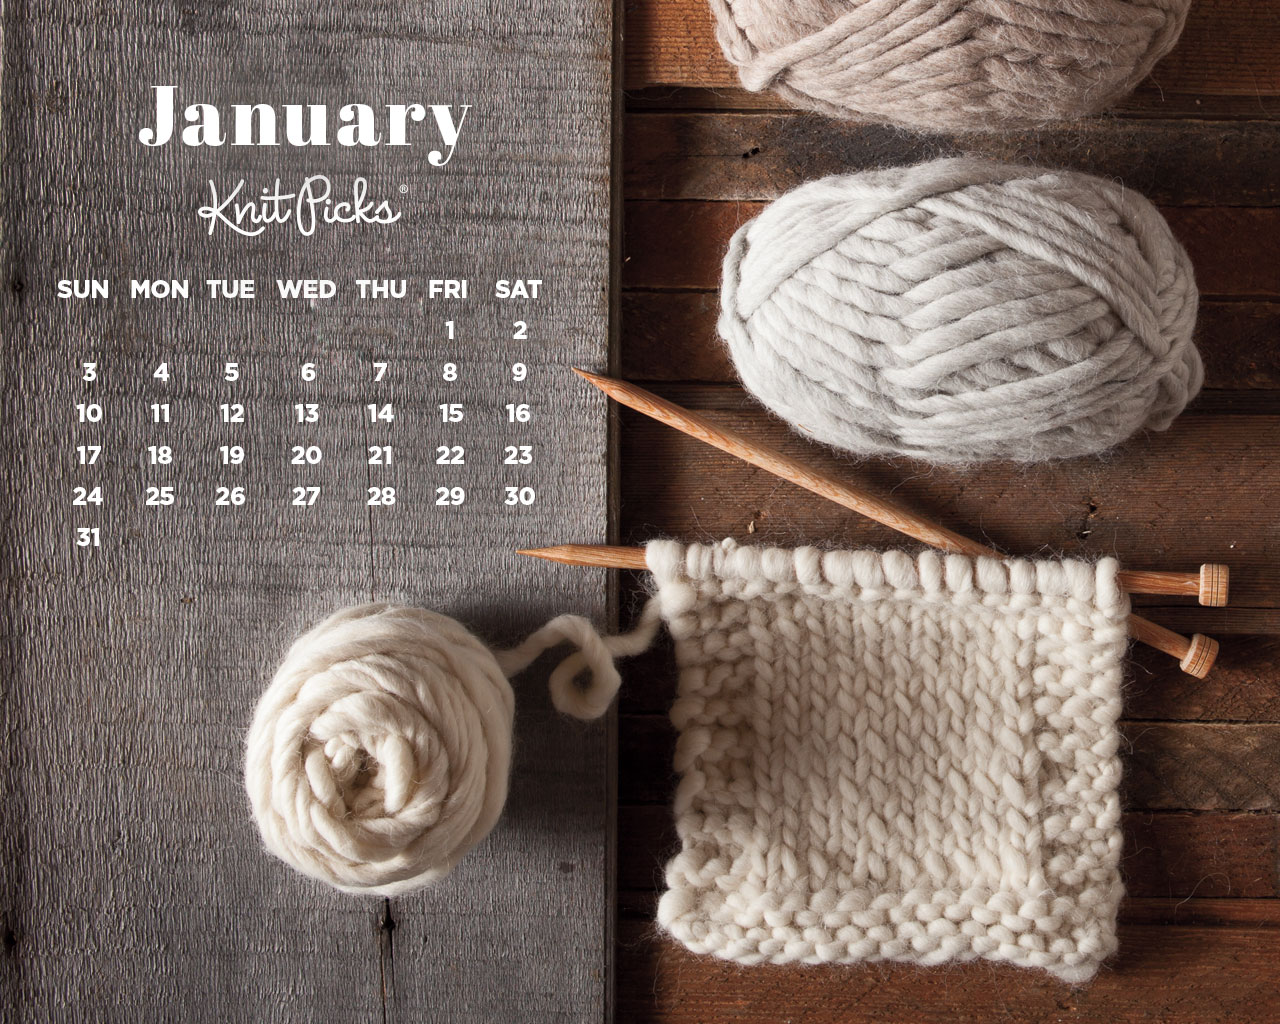 January 2016 Calendar KnitPicks Staff Knitting Blog